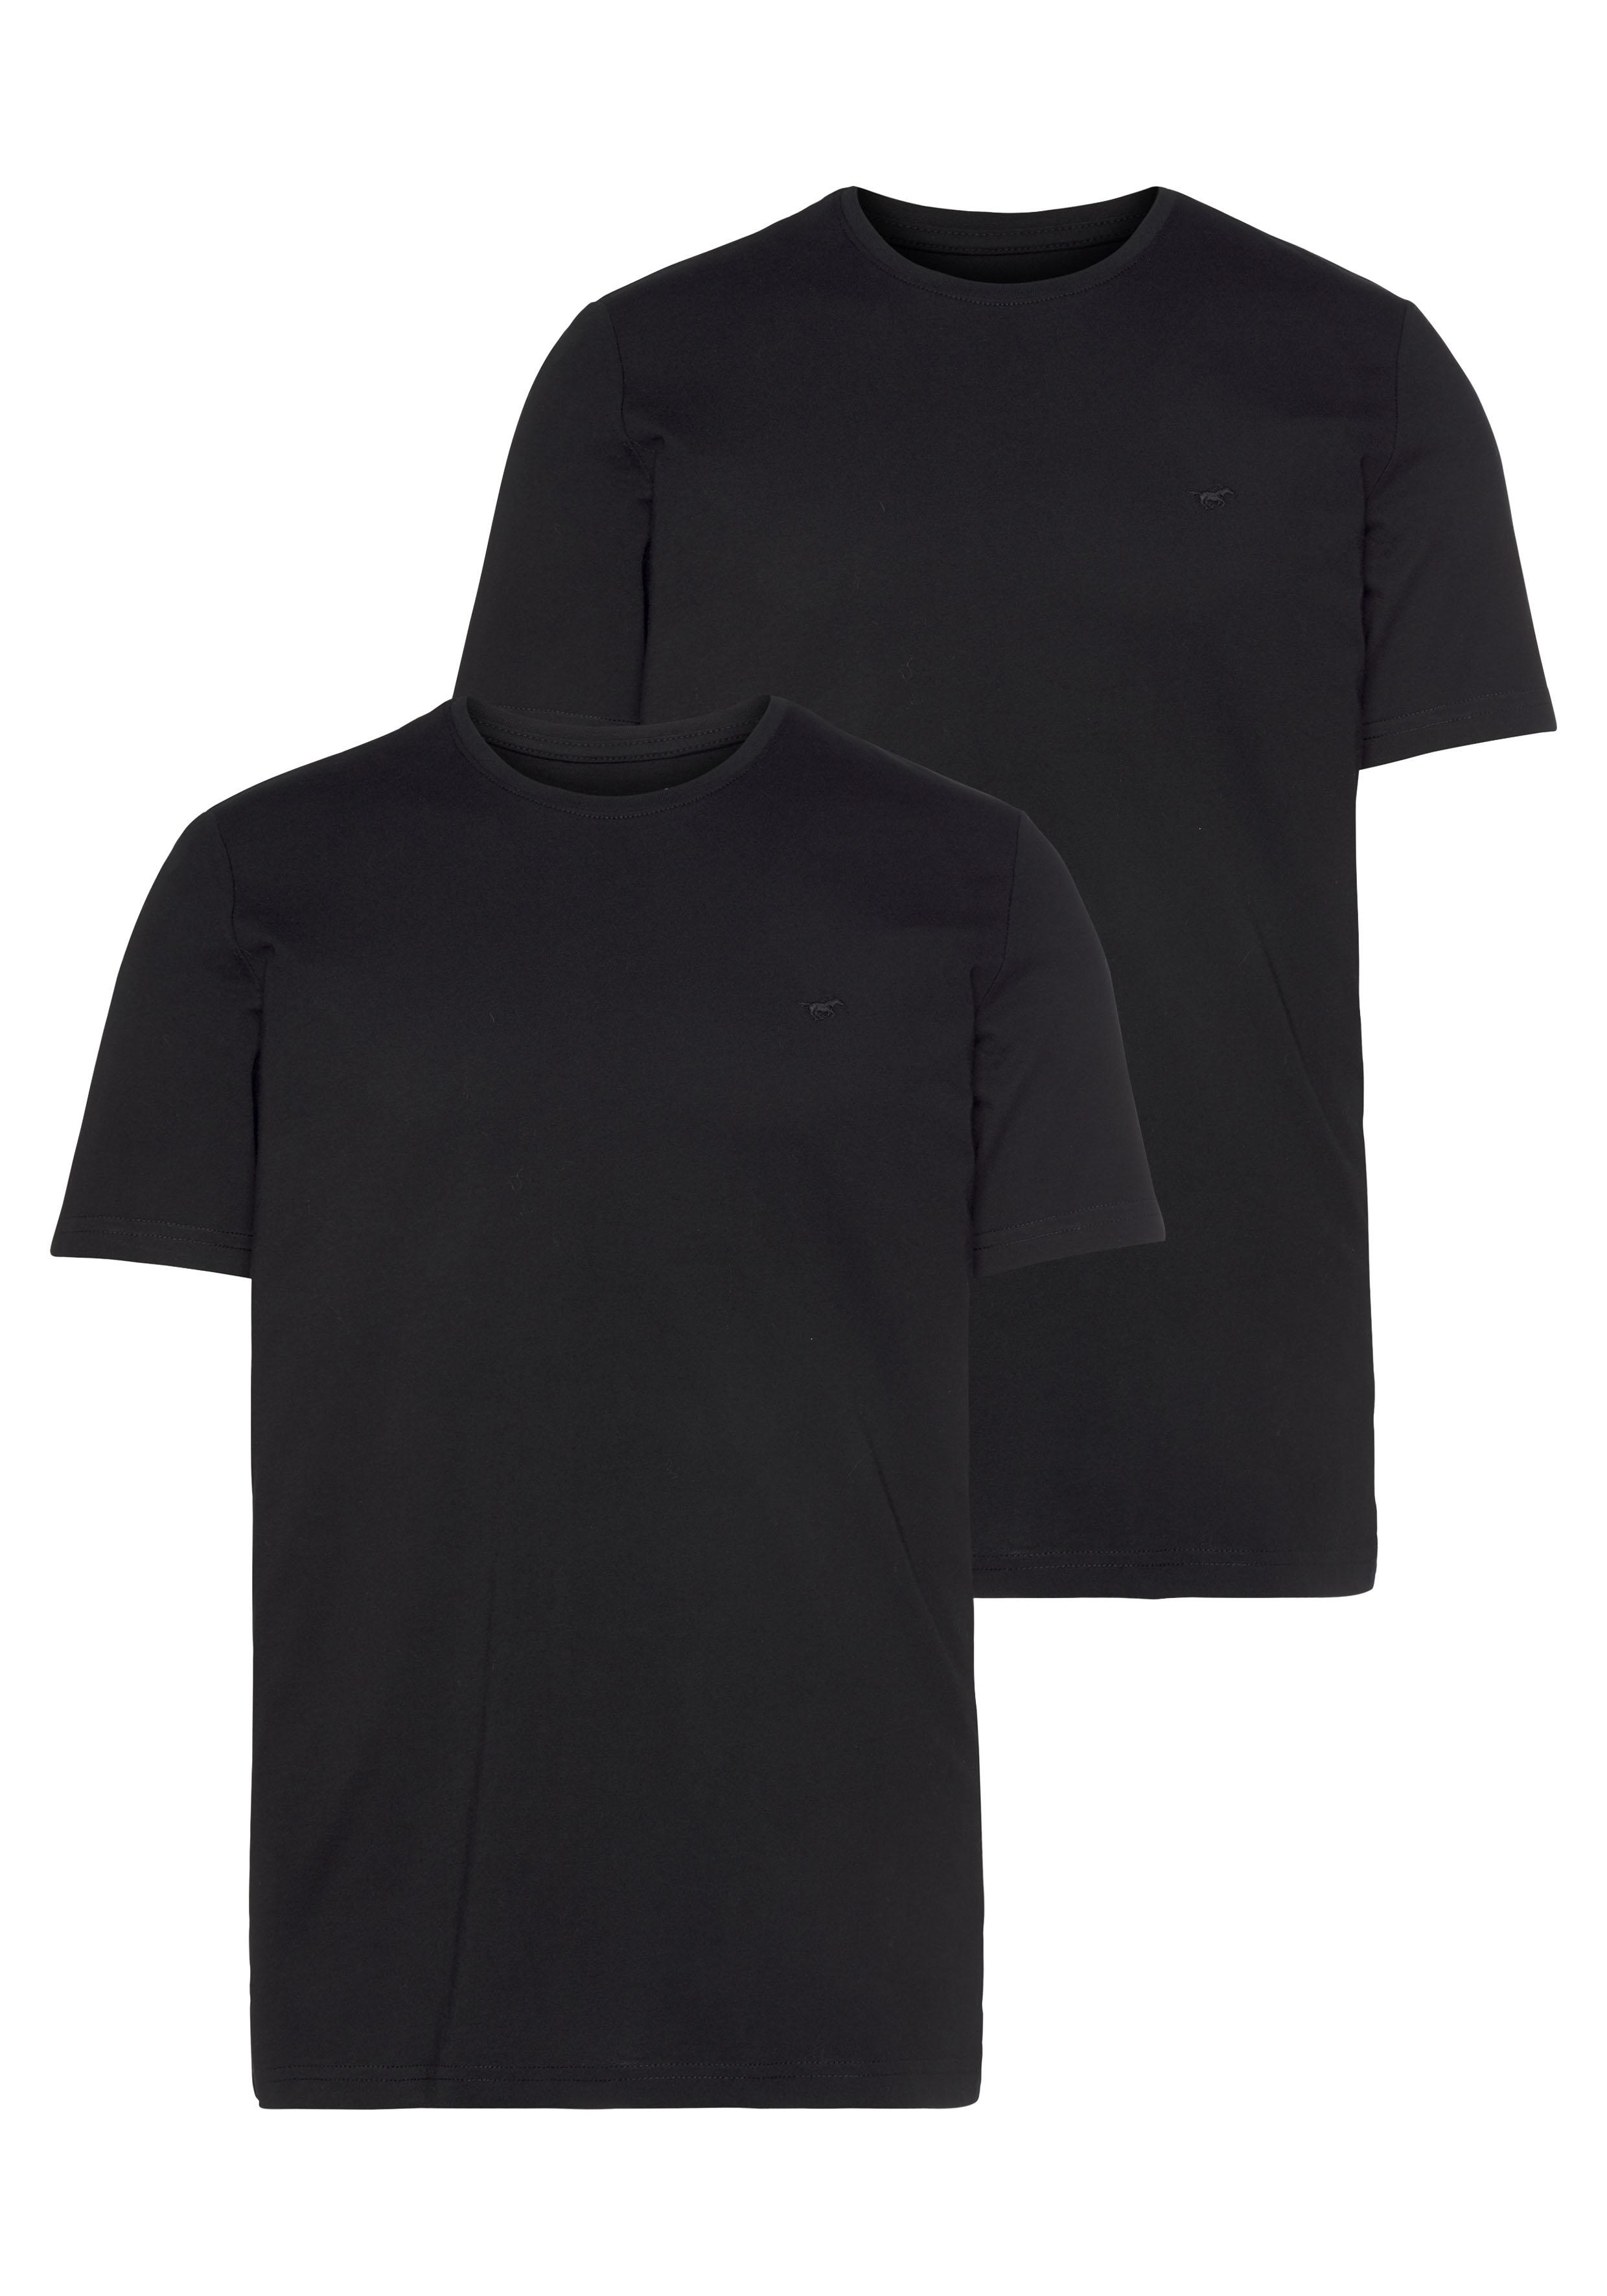 mustang -  T-Shirt, mit Rundhals